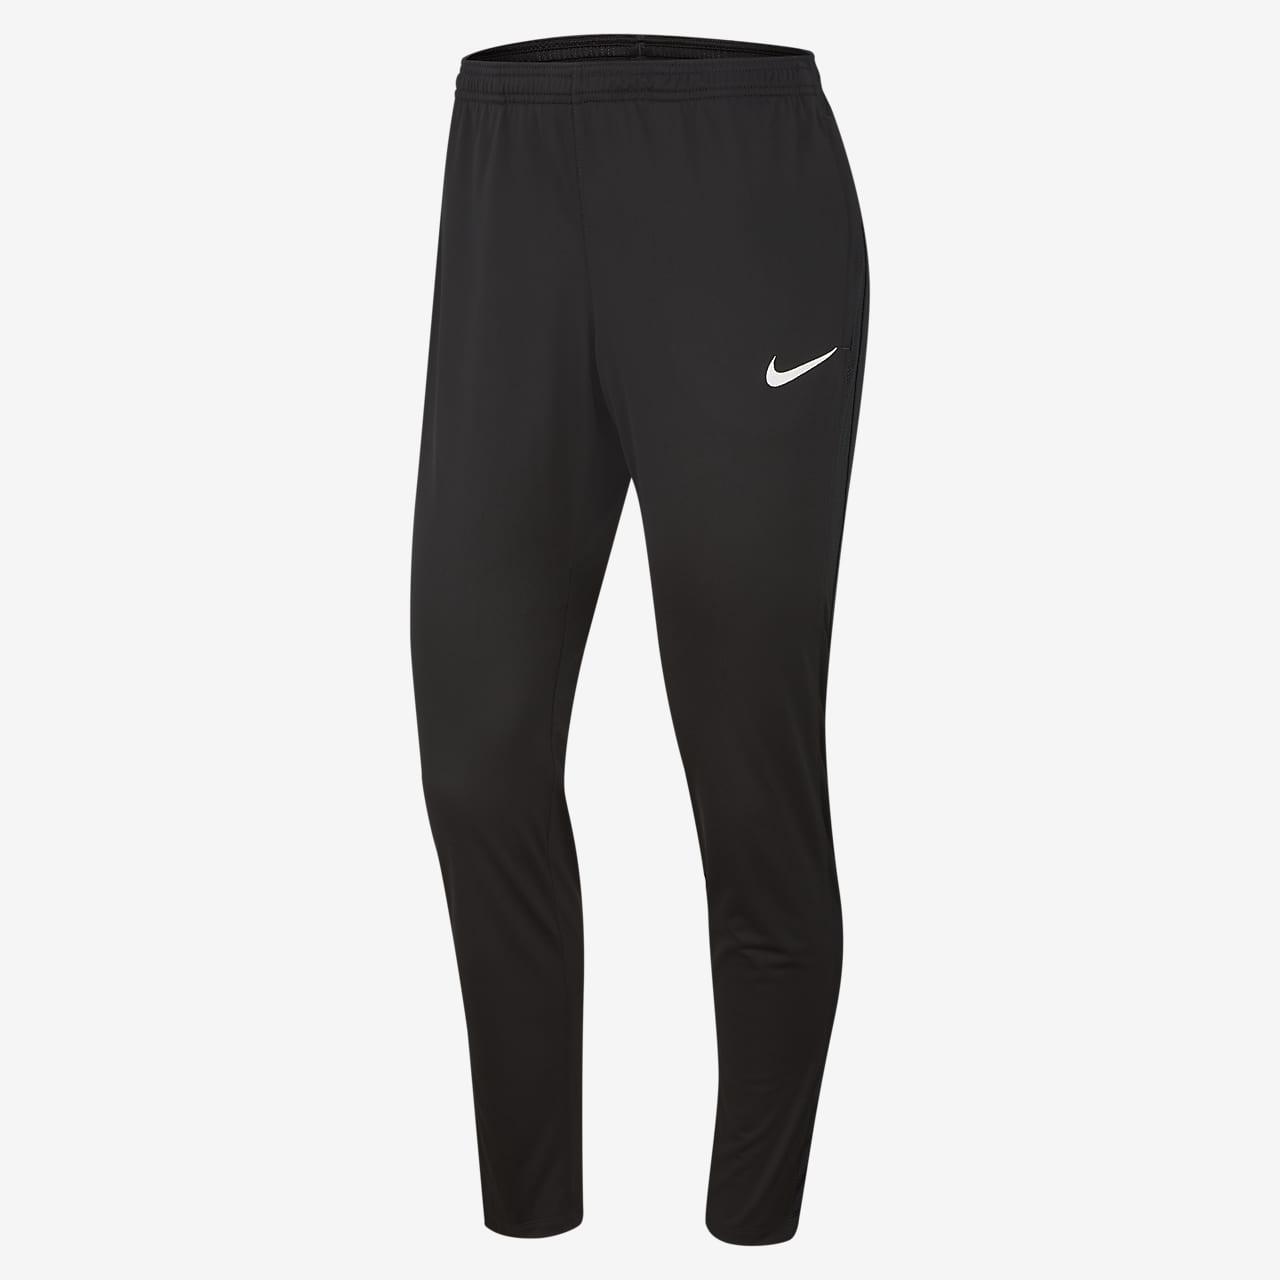 Nike Dri-FIT Academy 18 Damen-Fußballshorts